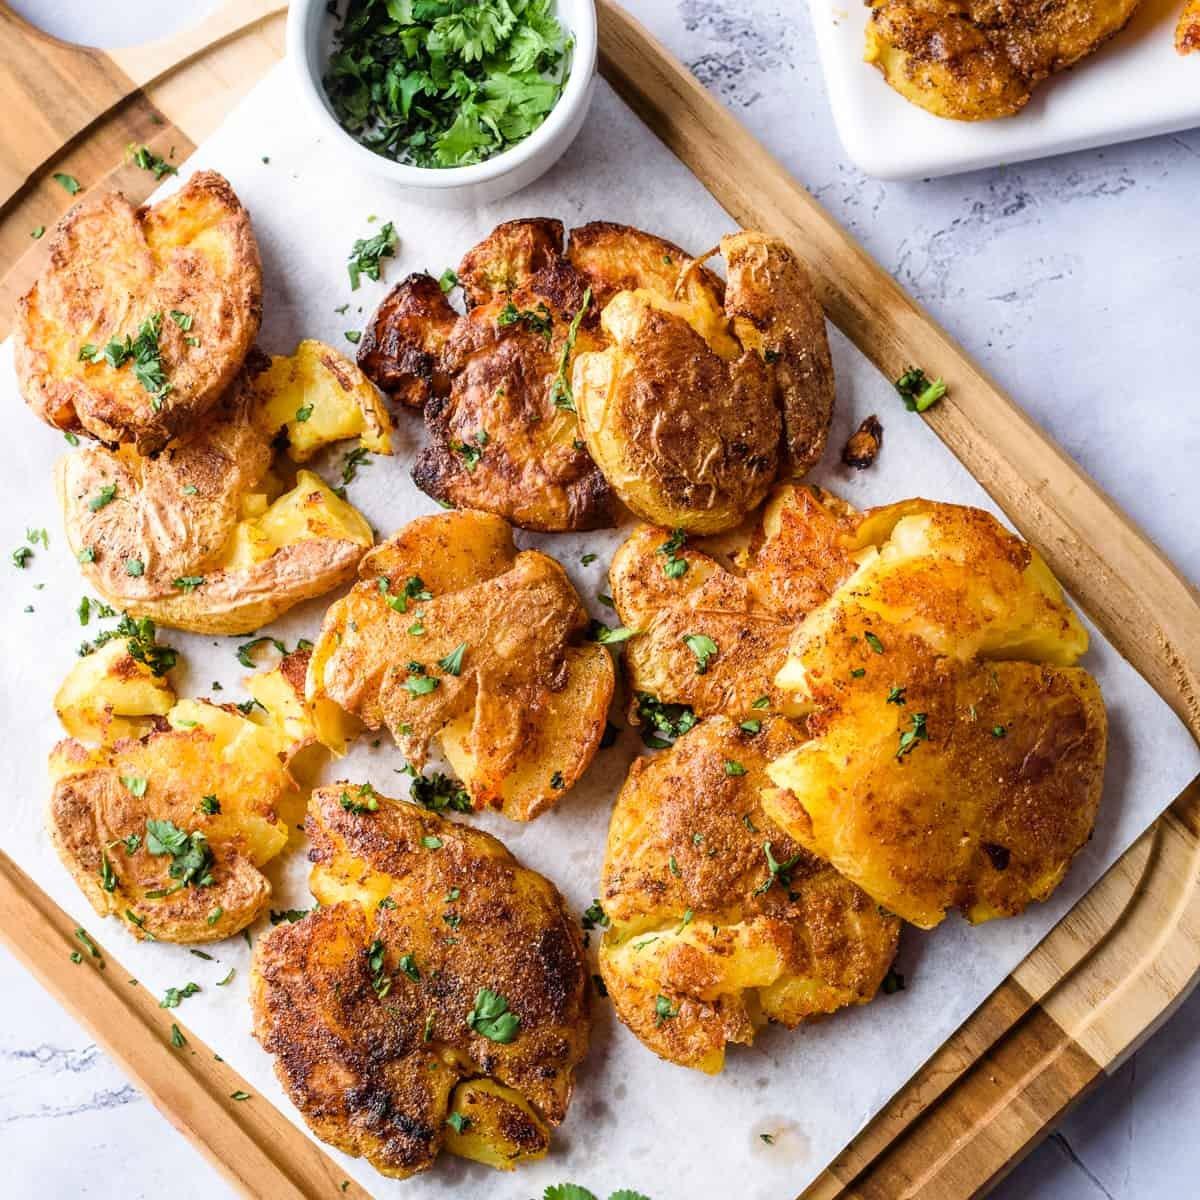 Close up image of garlic smashed potatoes